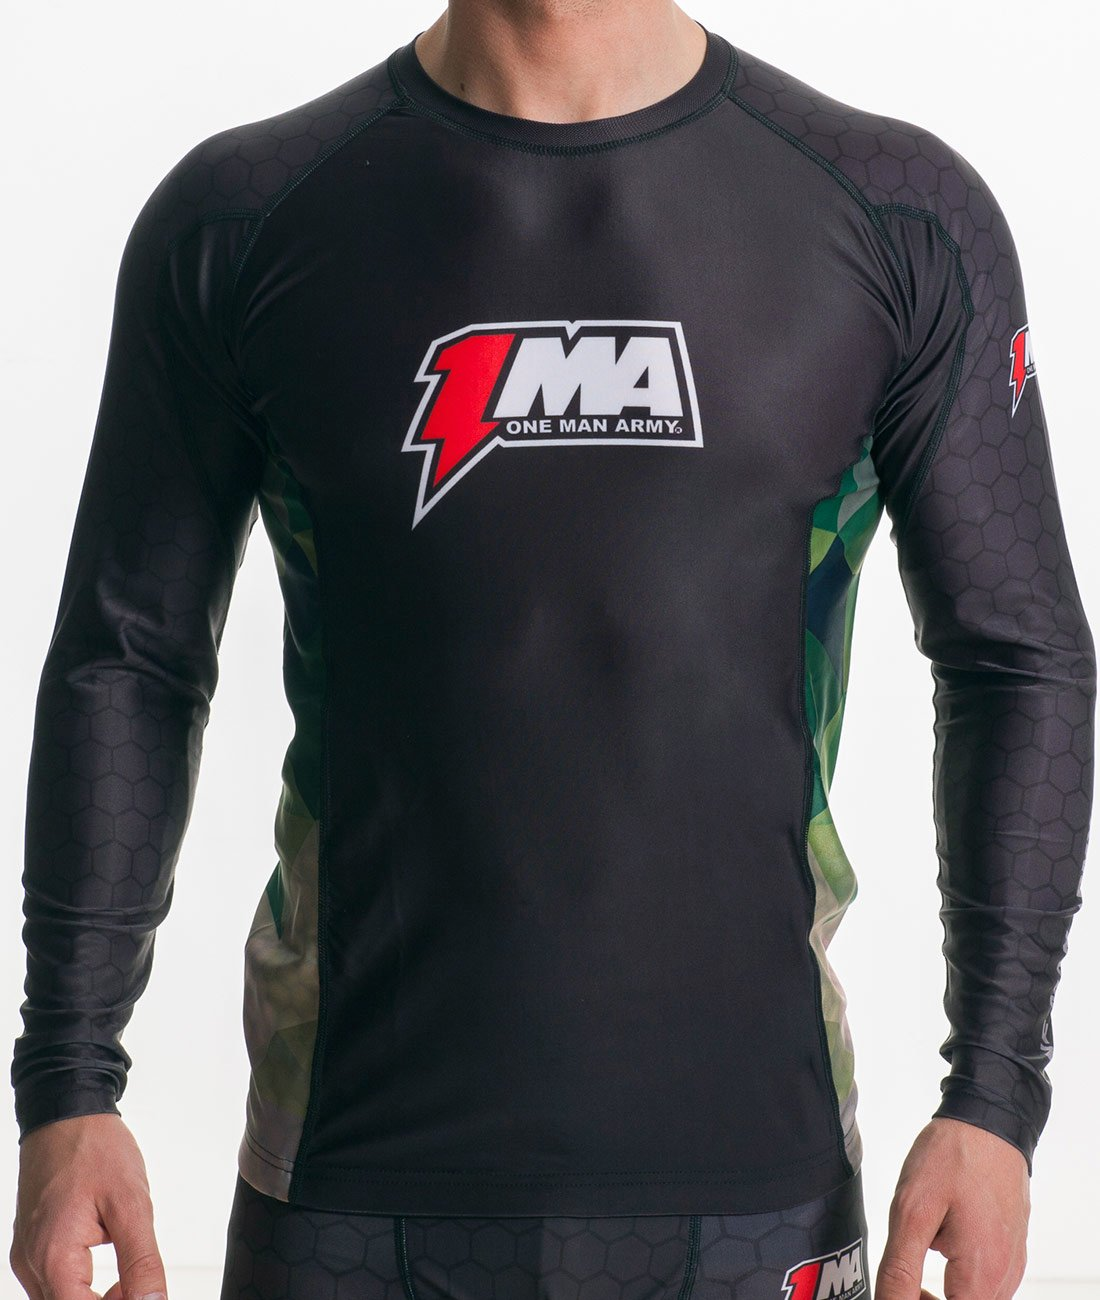 Rashguard One Man Army MMA Grappling BJJ Fightwear Kompression Funktion Atmungsaktiv Shirt Langarm Schwarz Camo